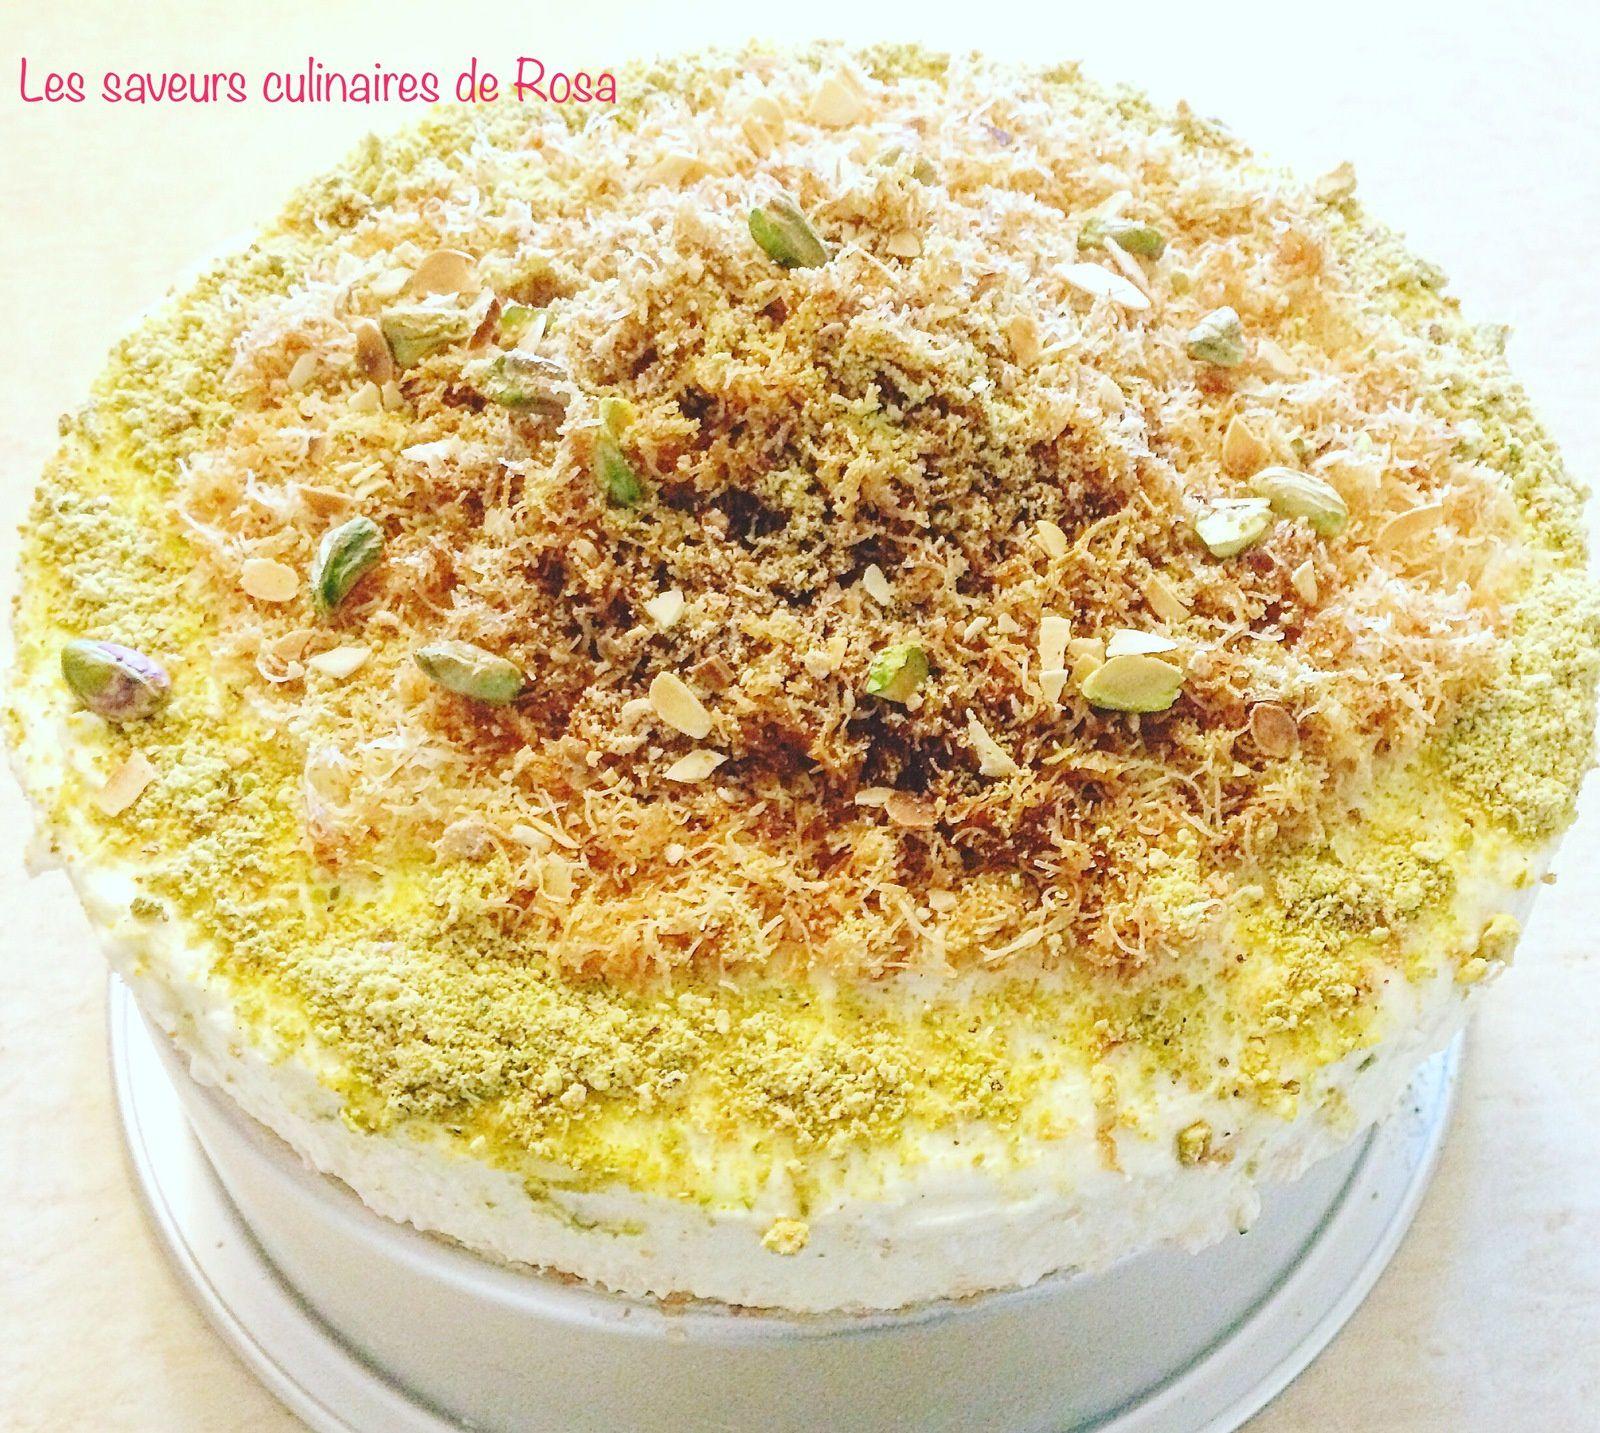 Kounafa cheesecake (kataif cheesecake)